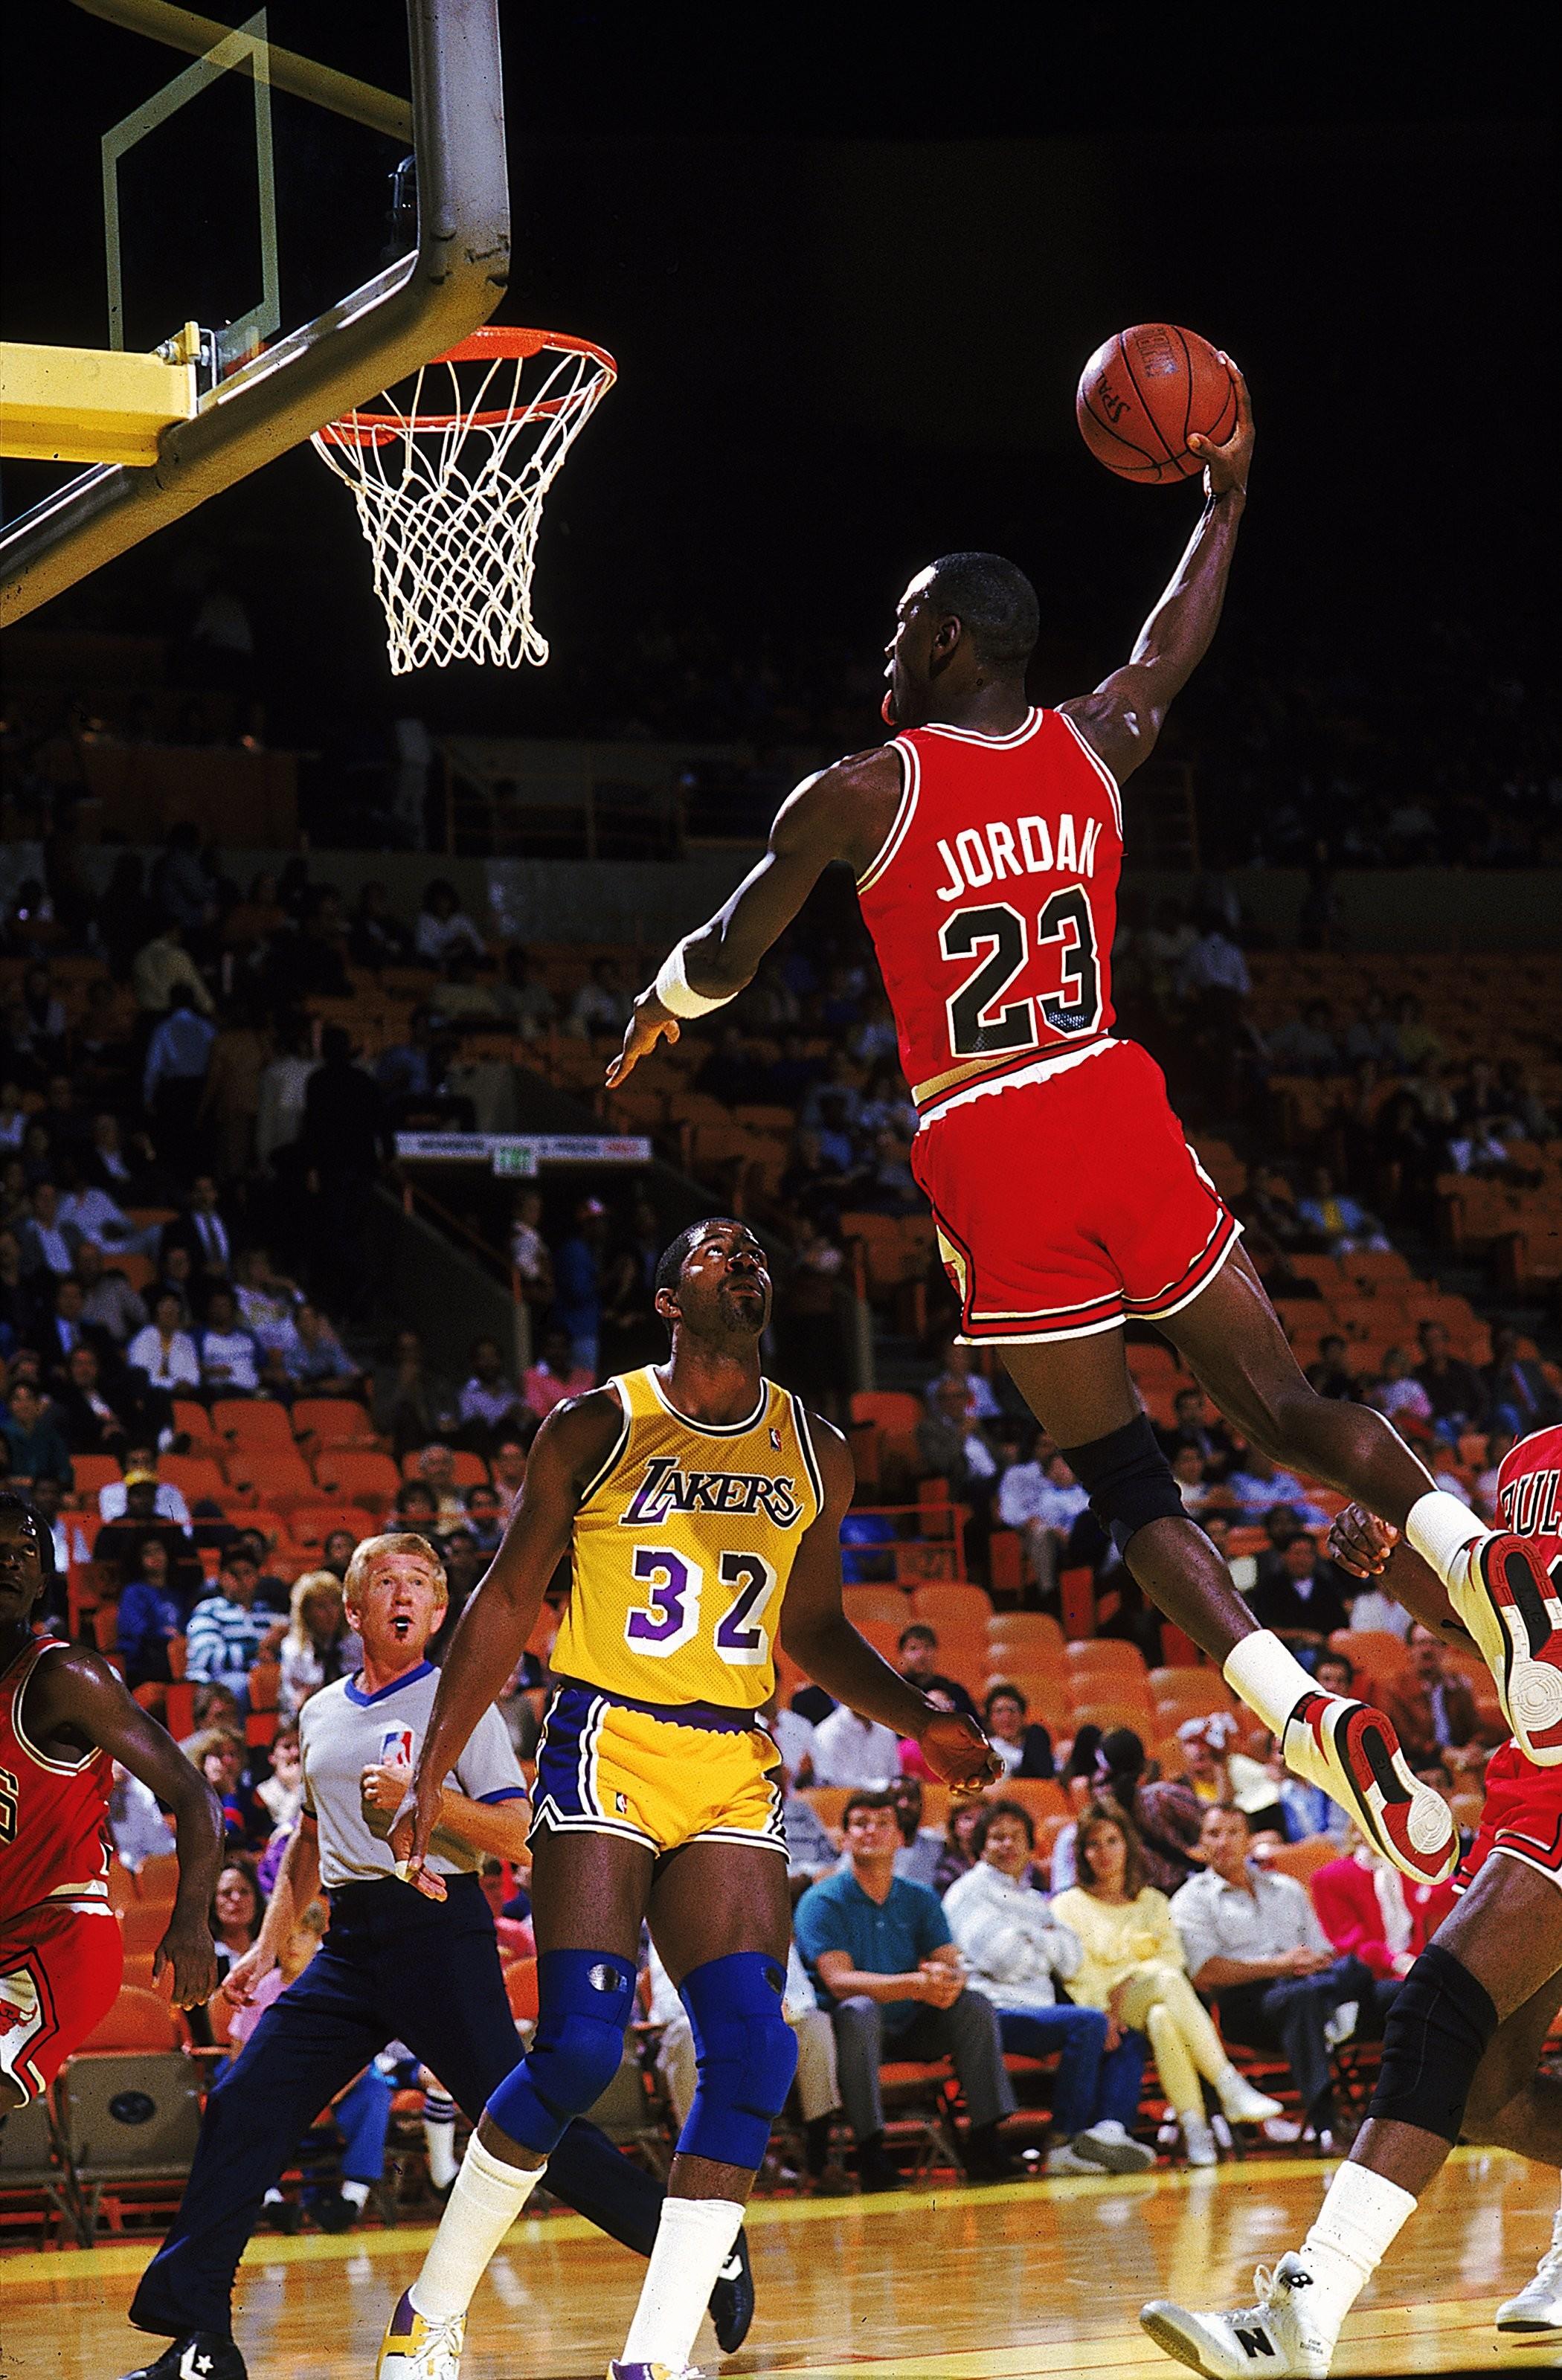 Michael Jordan Wallpaper Dunk 64 Pictures